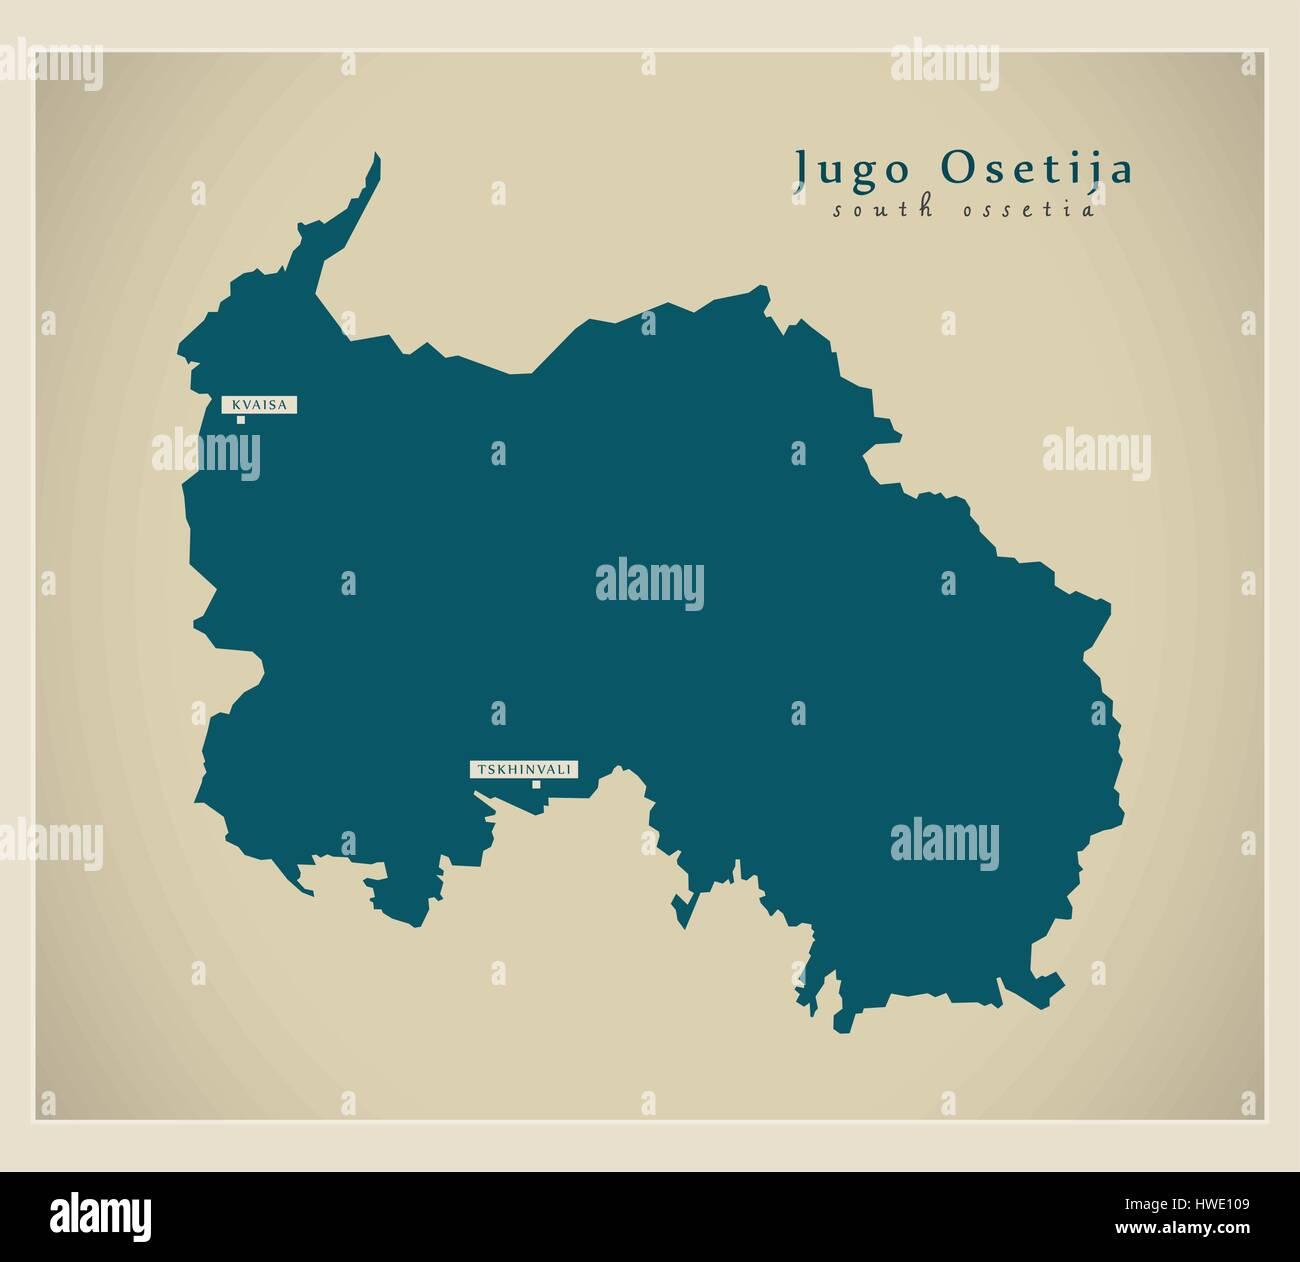 Modern Map - Jugo Osetija GE - Stock Image